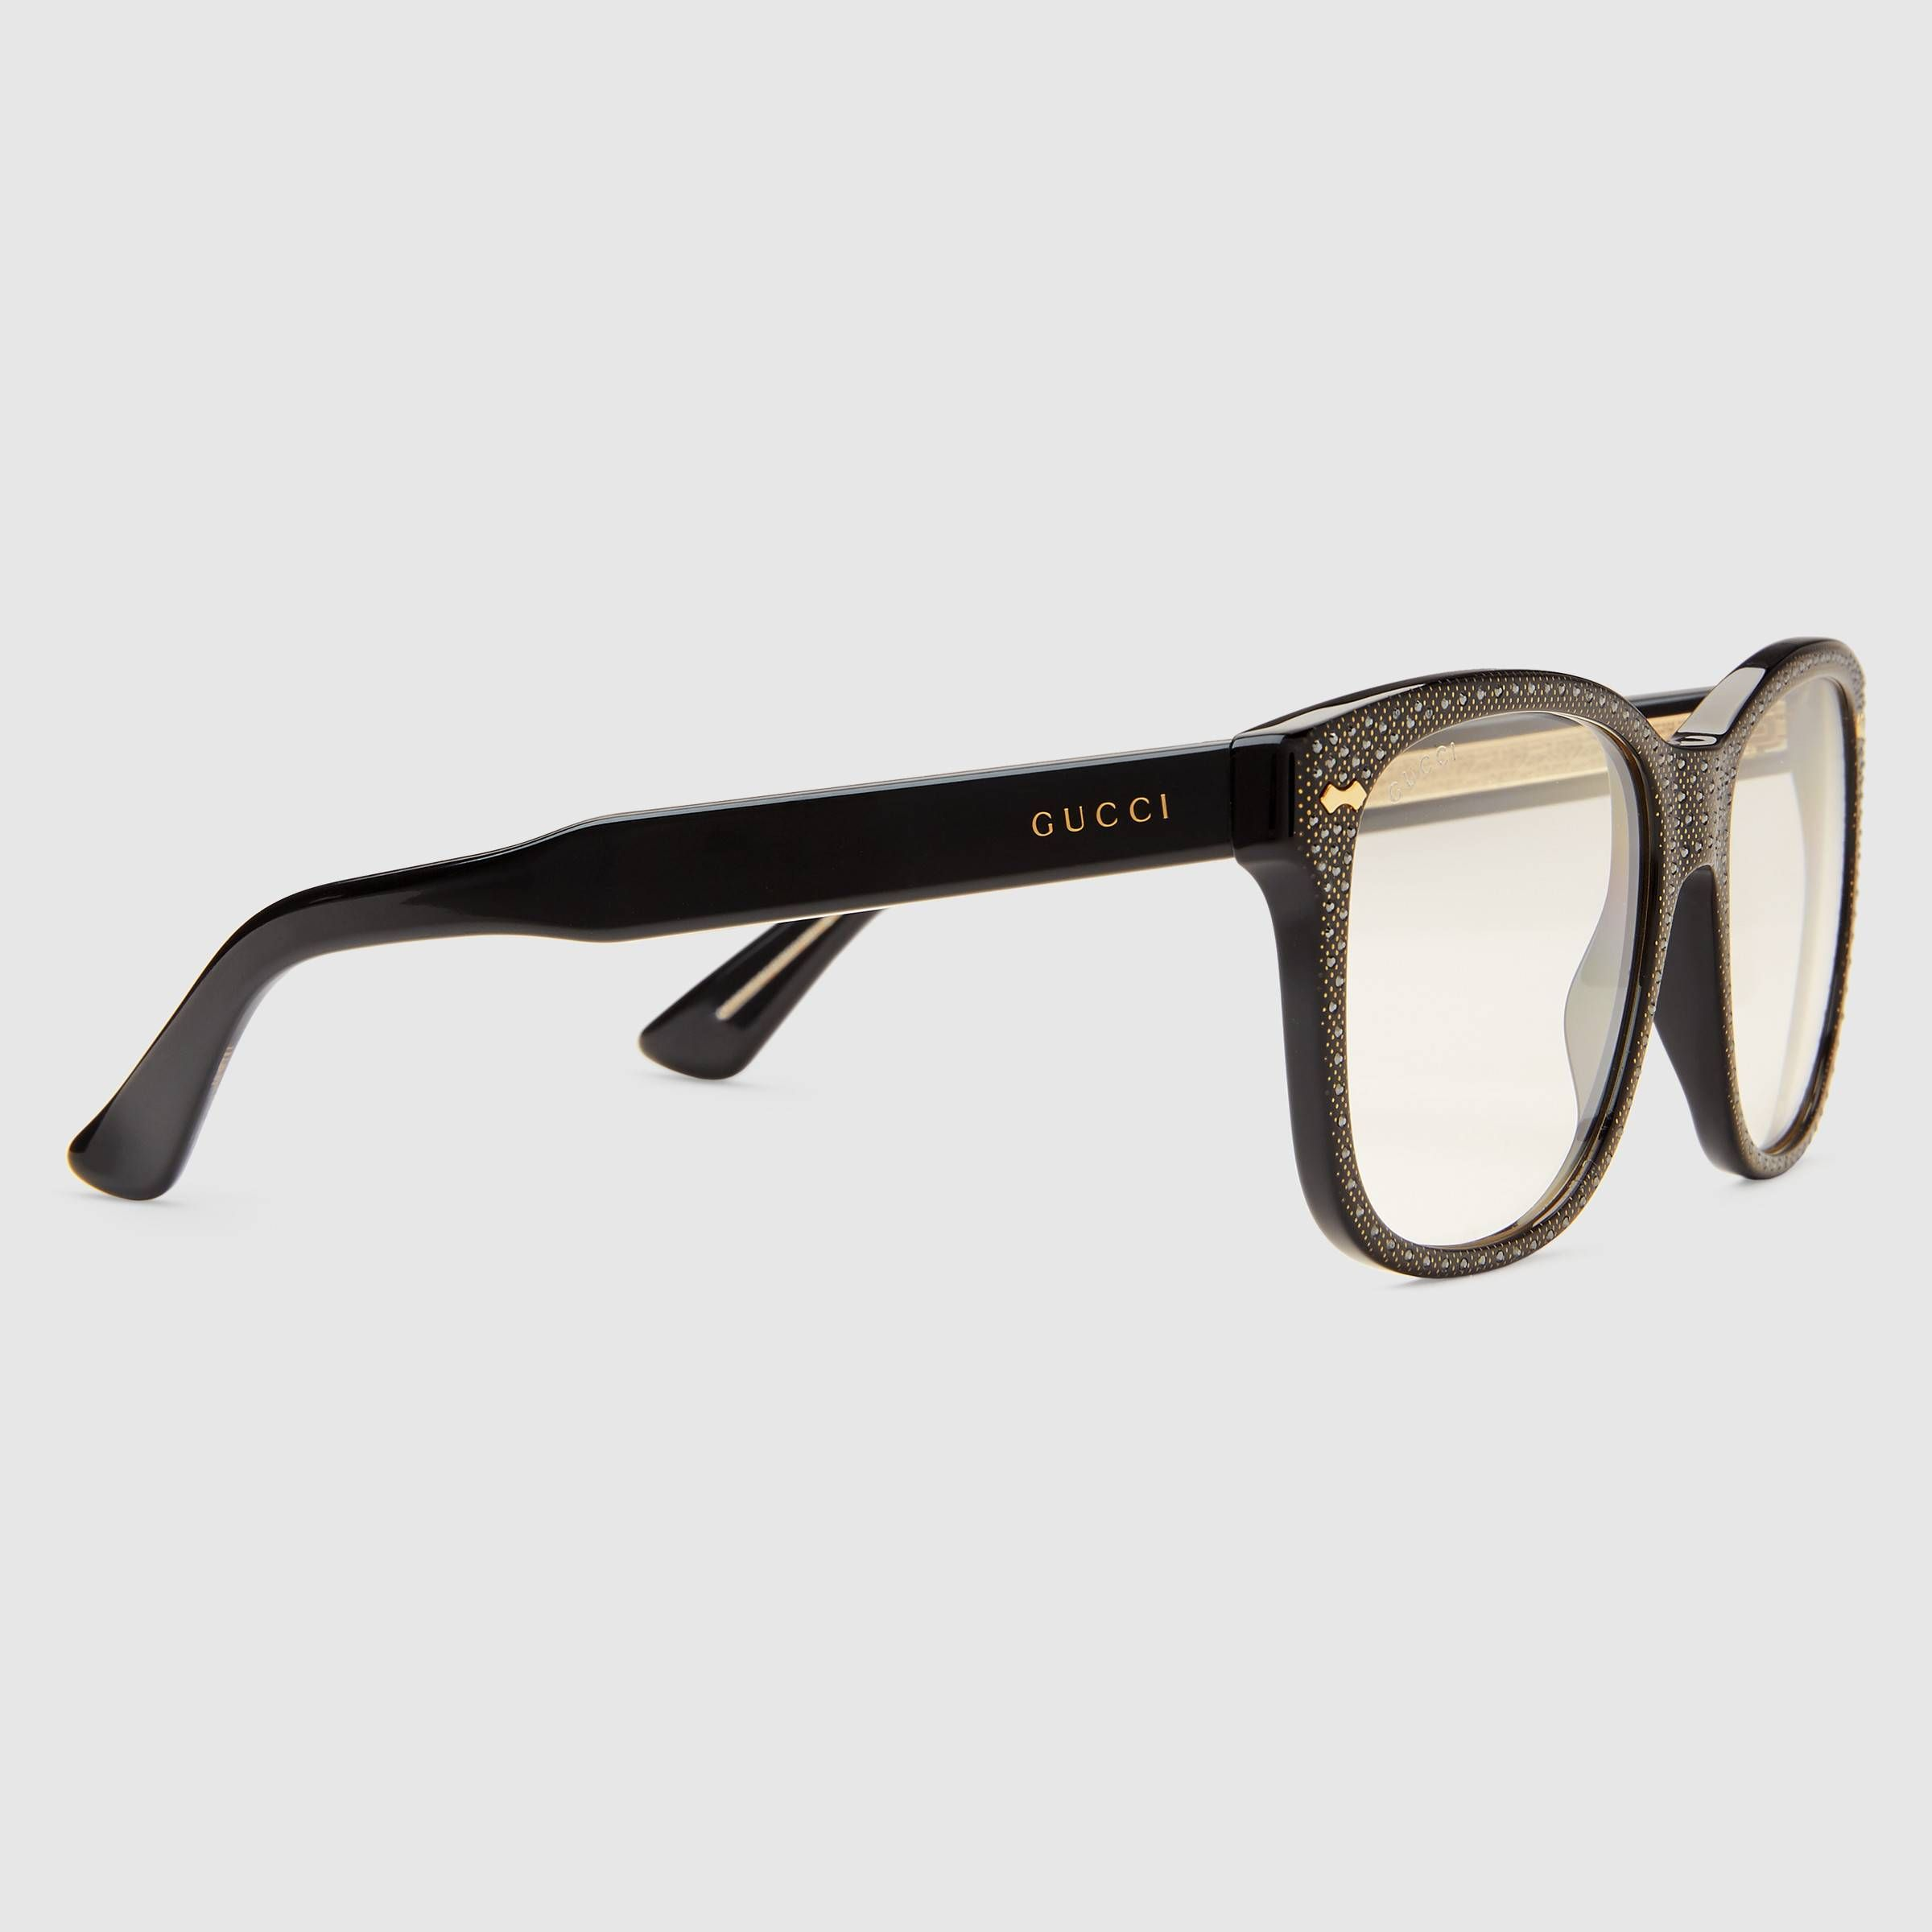 Rickey Smiley Rs 107 Men\'s Eyeglasses | Danny Grandmas young man who ...